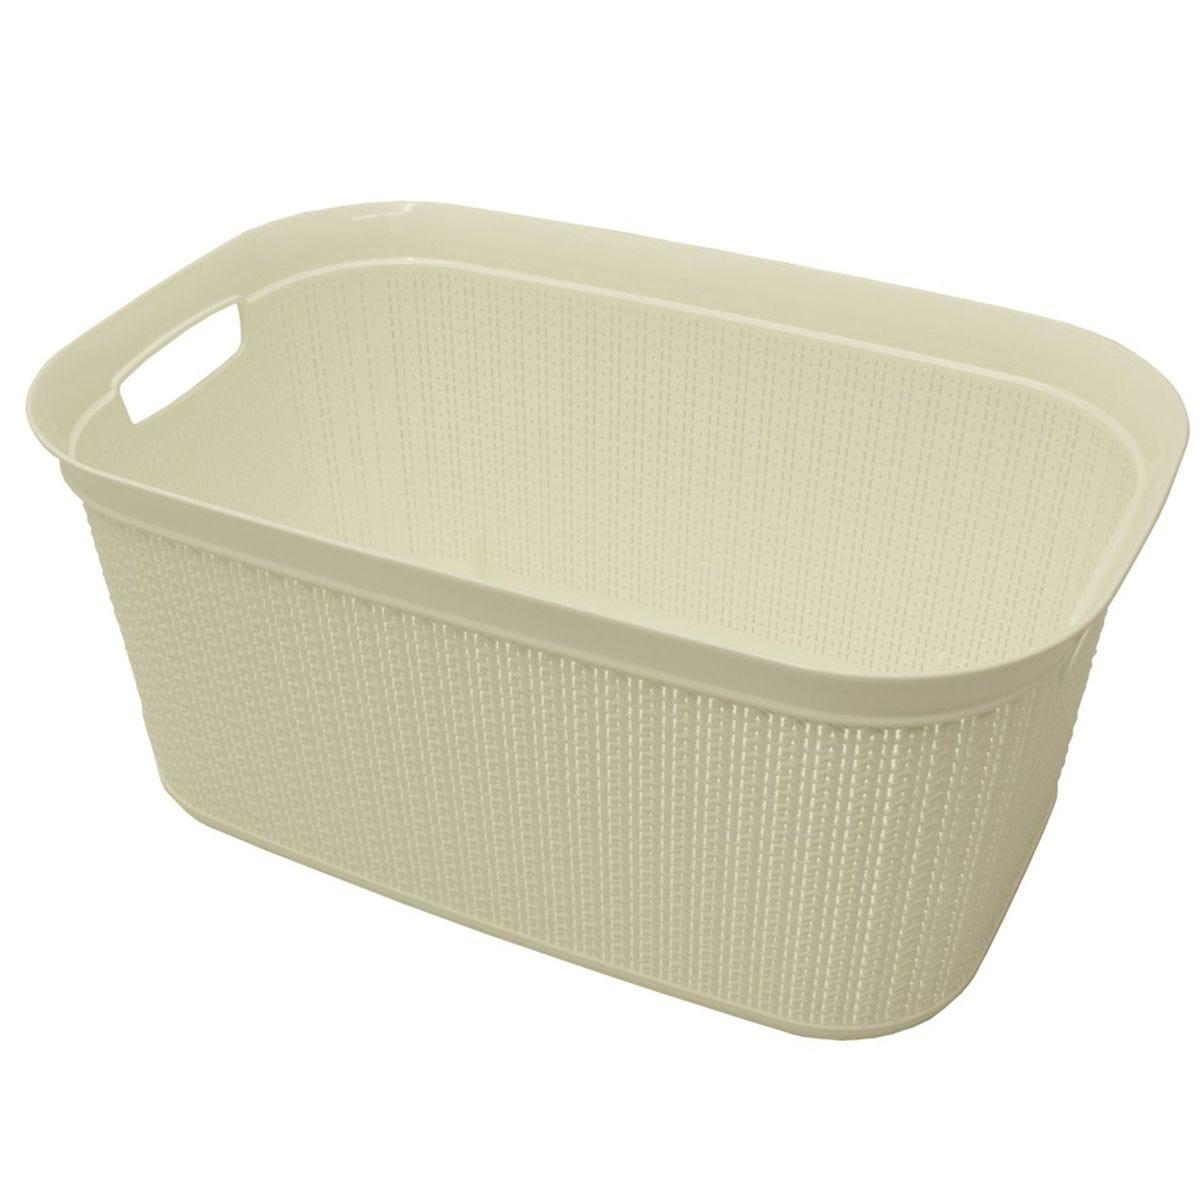 JVL 38L Knit Design Rectangular Linen Washing Basket - White